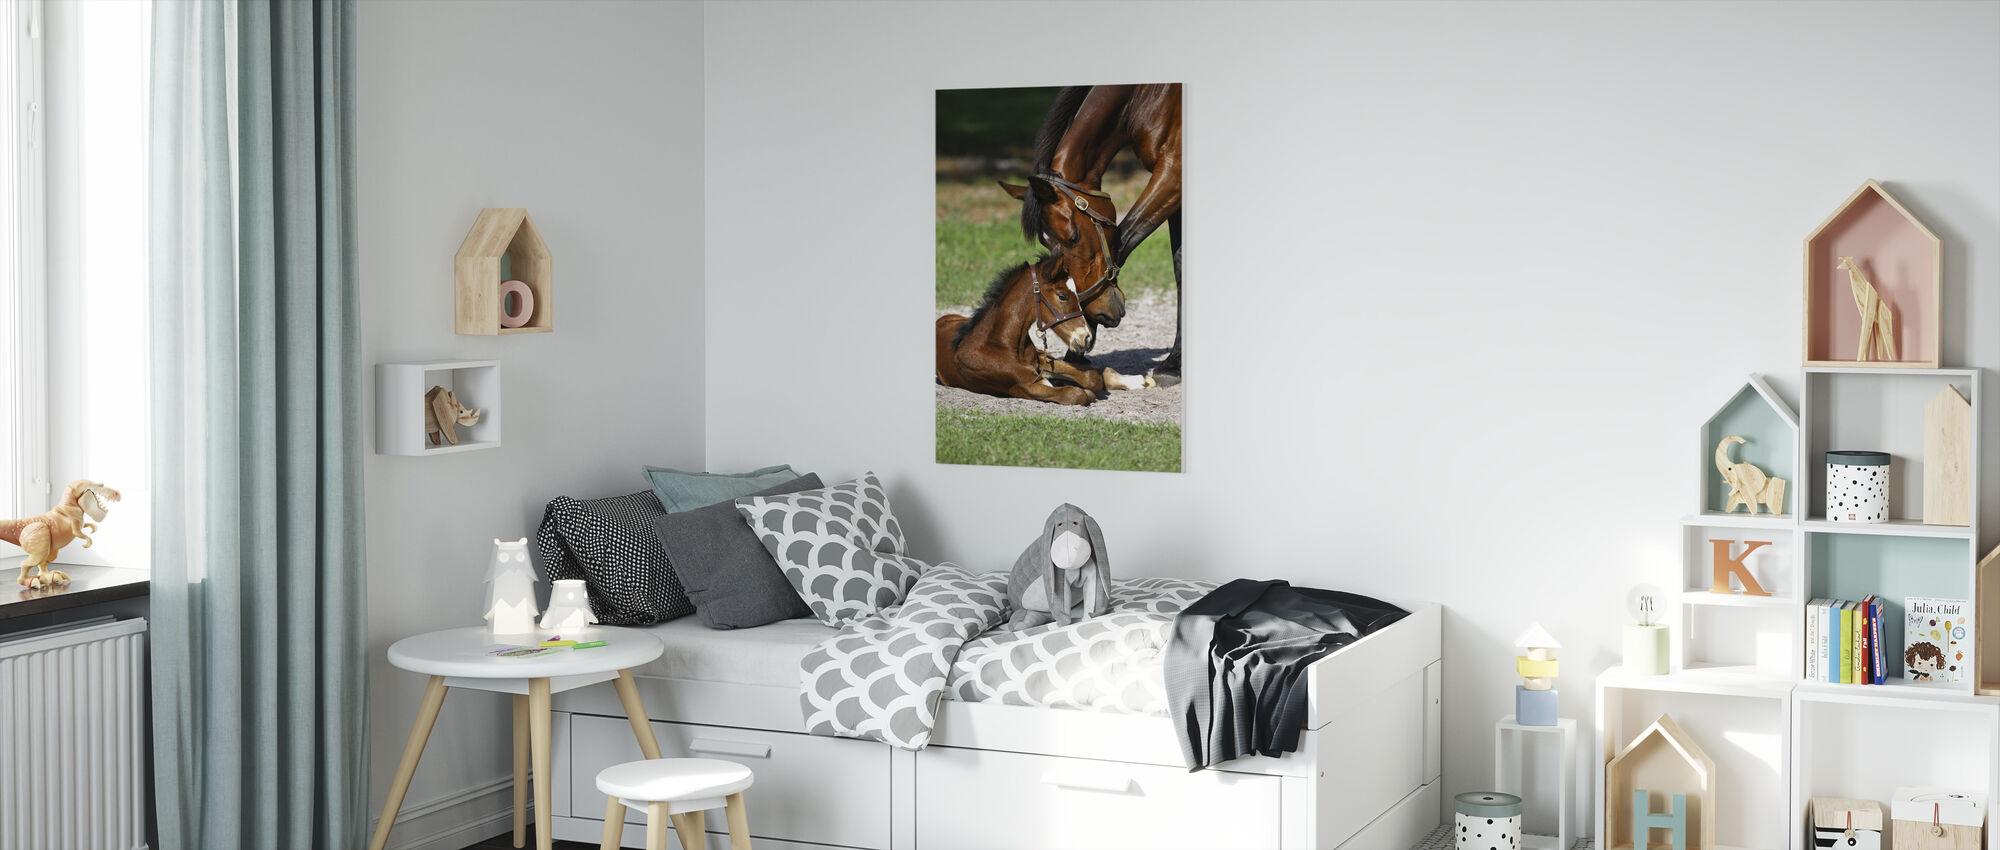 Thoroughbred Horses Cuddling - Canvas print - Kids Room